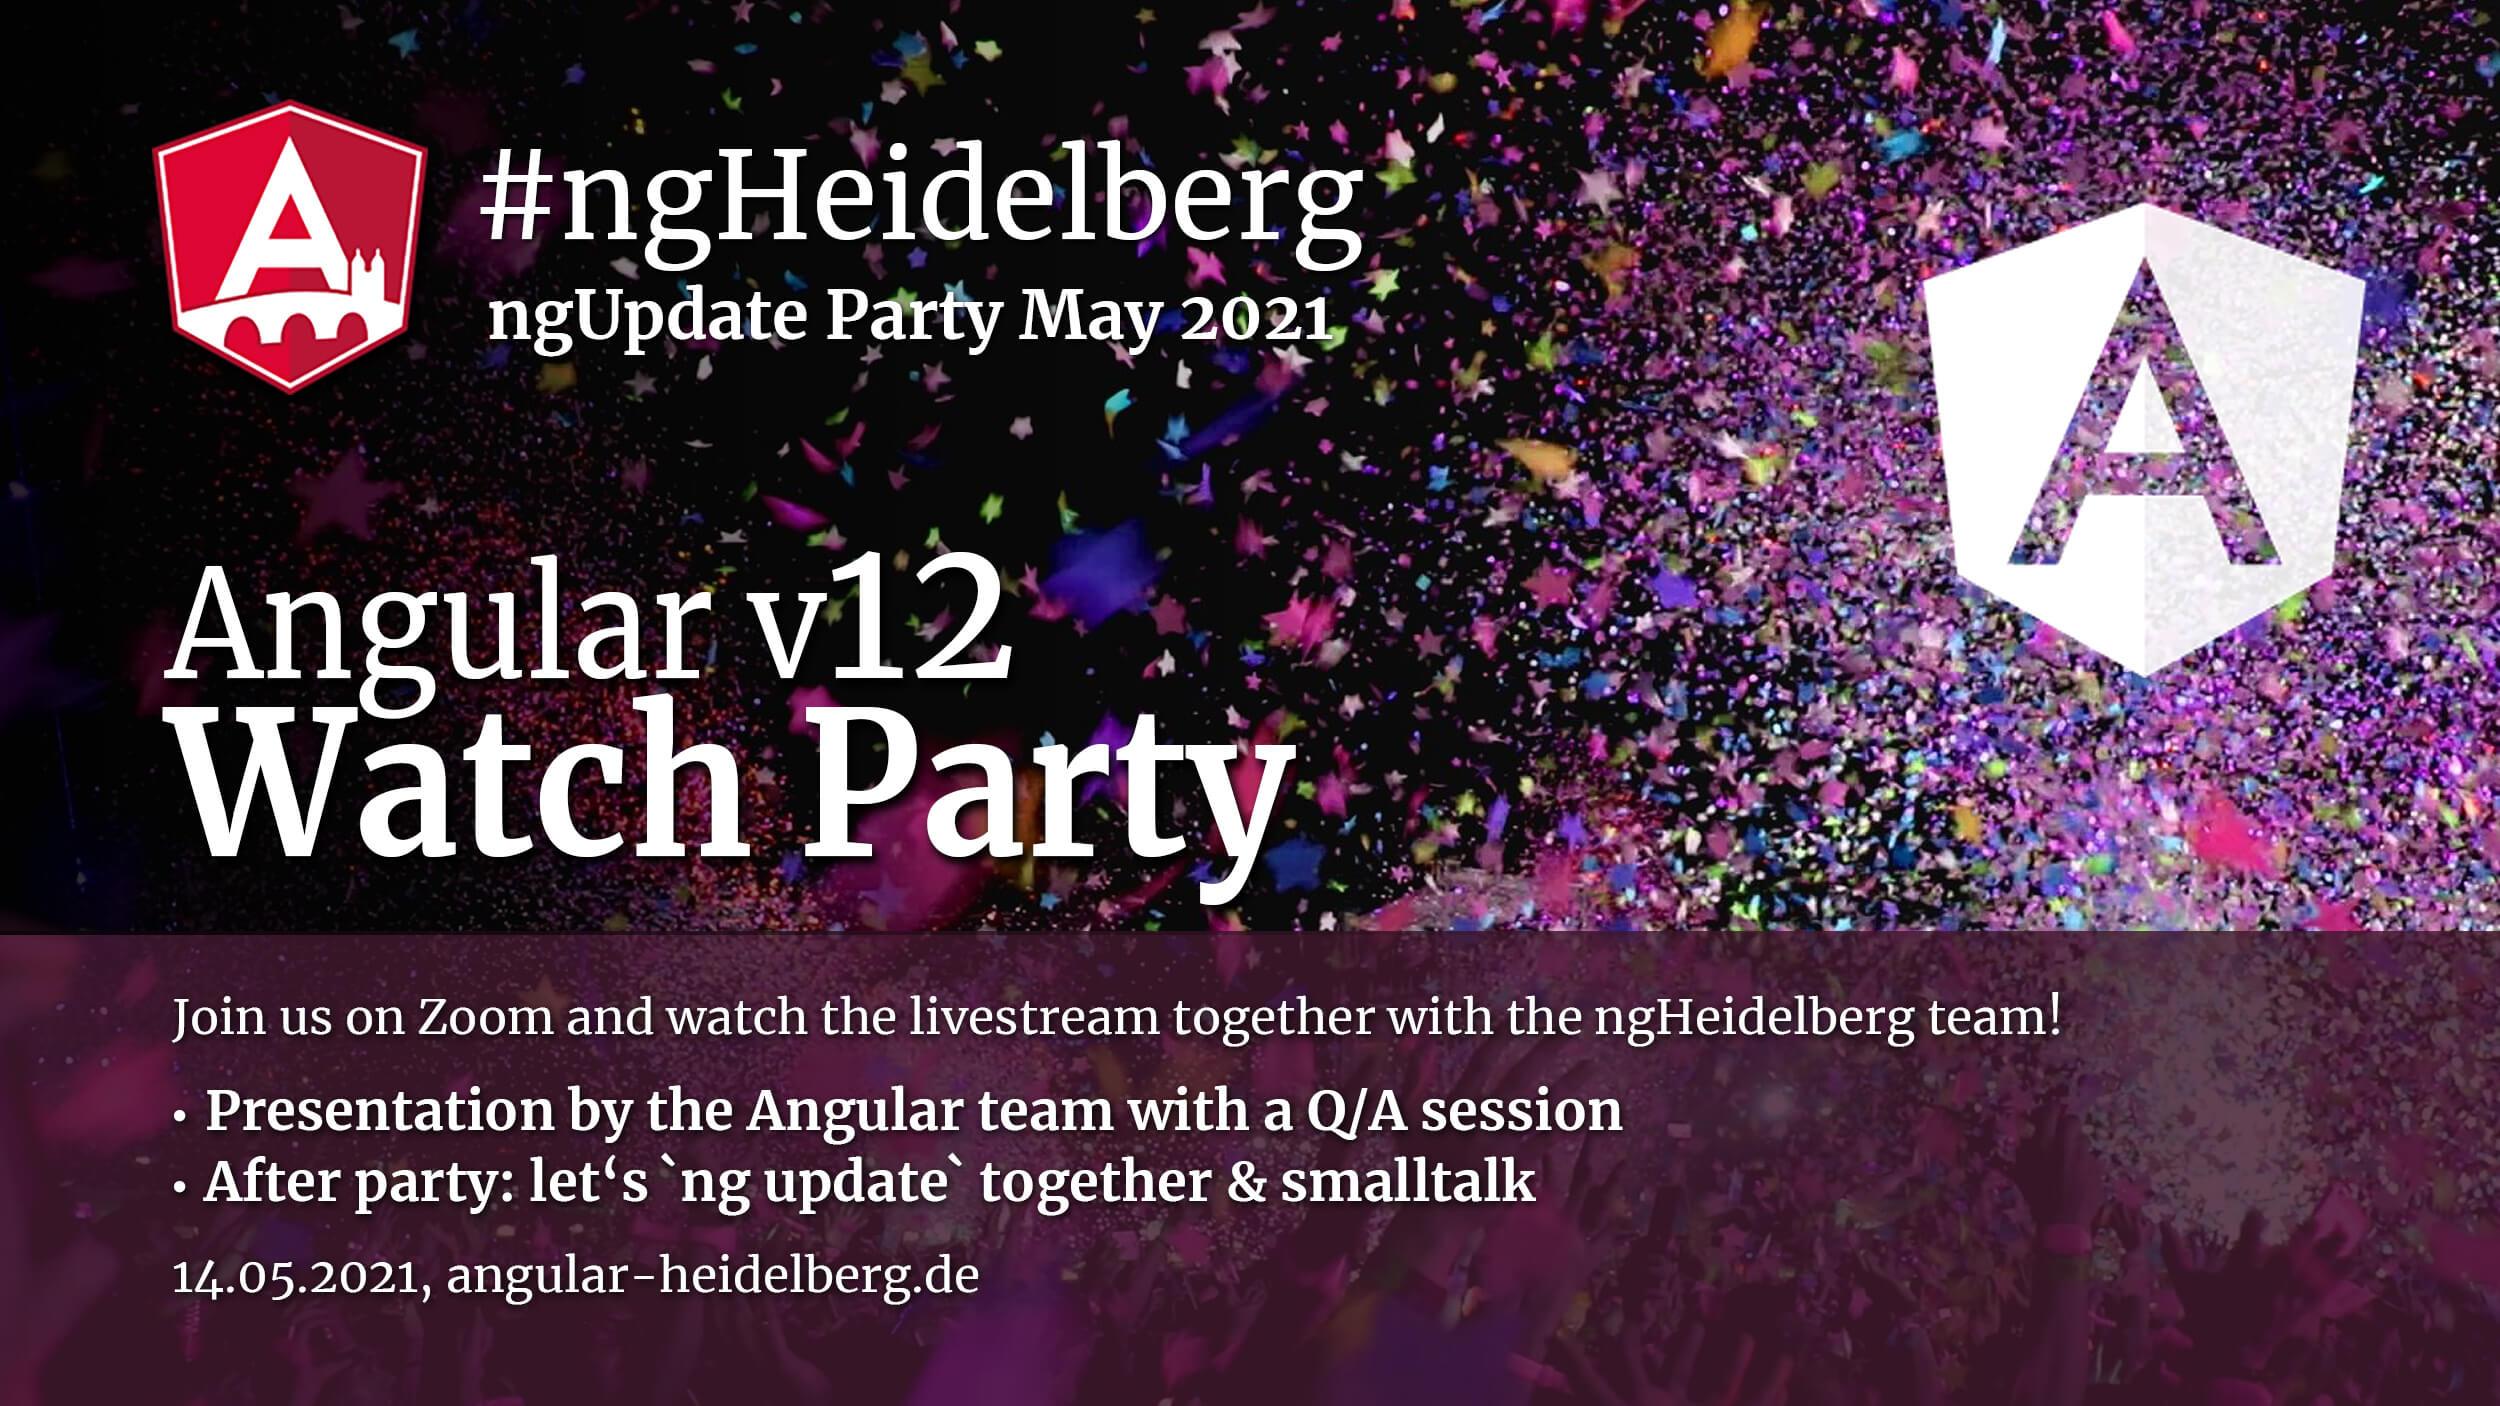 ngHeidelberg Logo